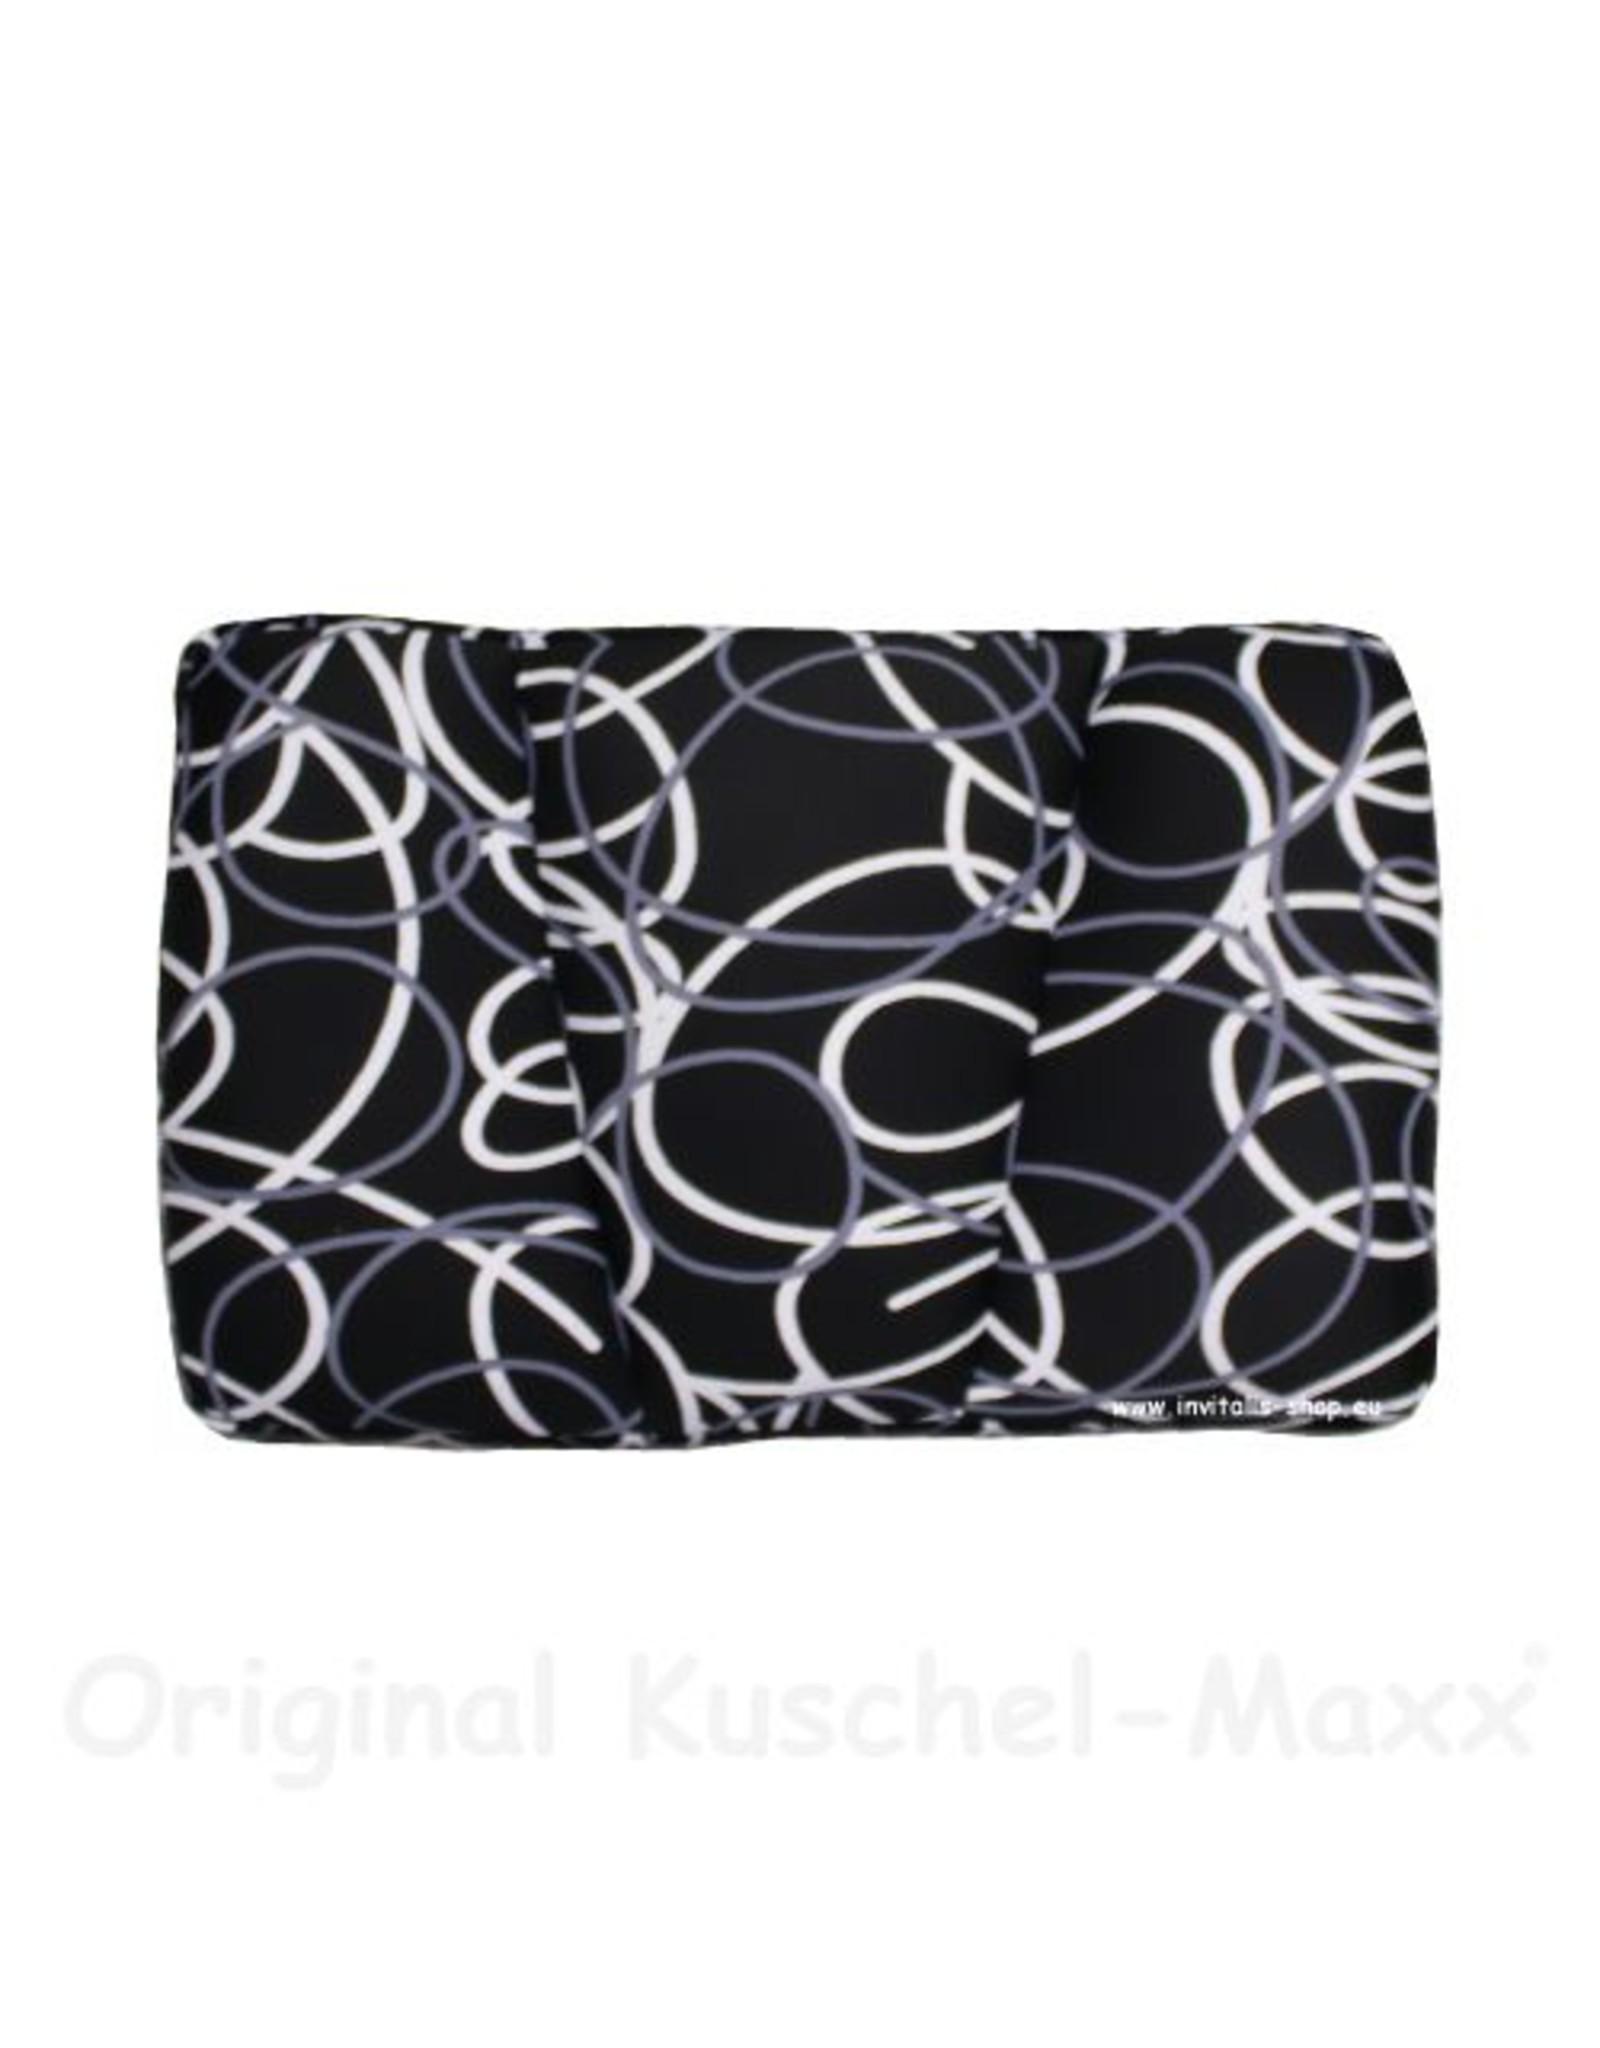 Kuschel-Maxx Kuschel-Maxx - Sleeppillow  Lines Black